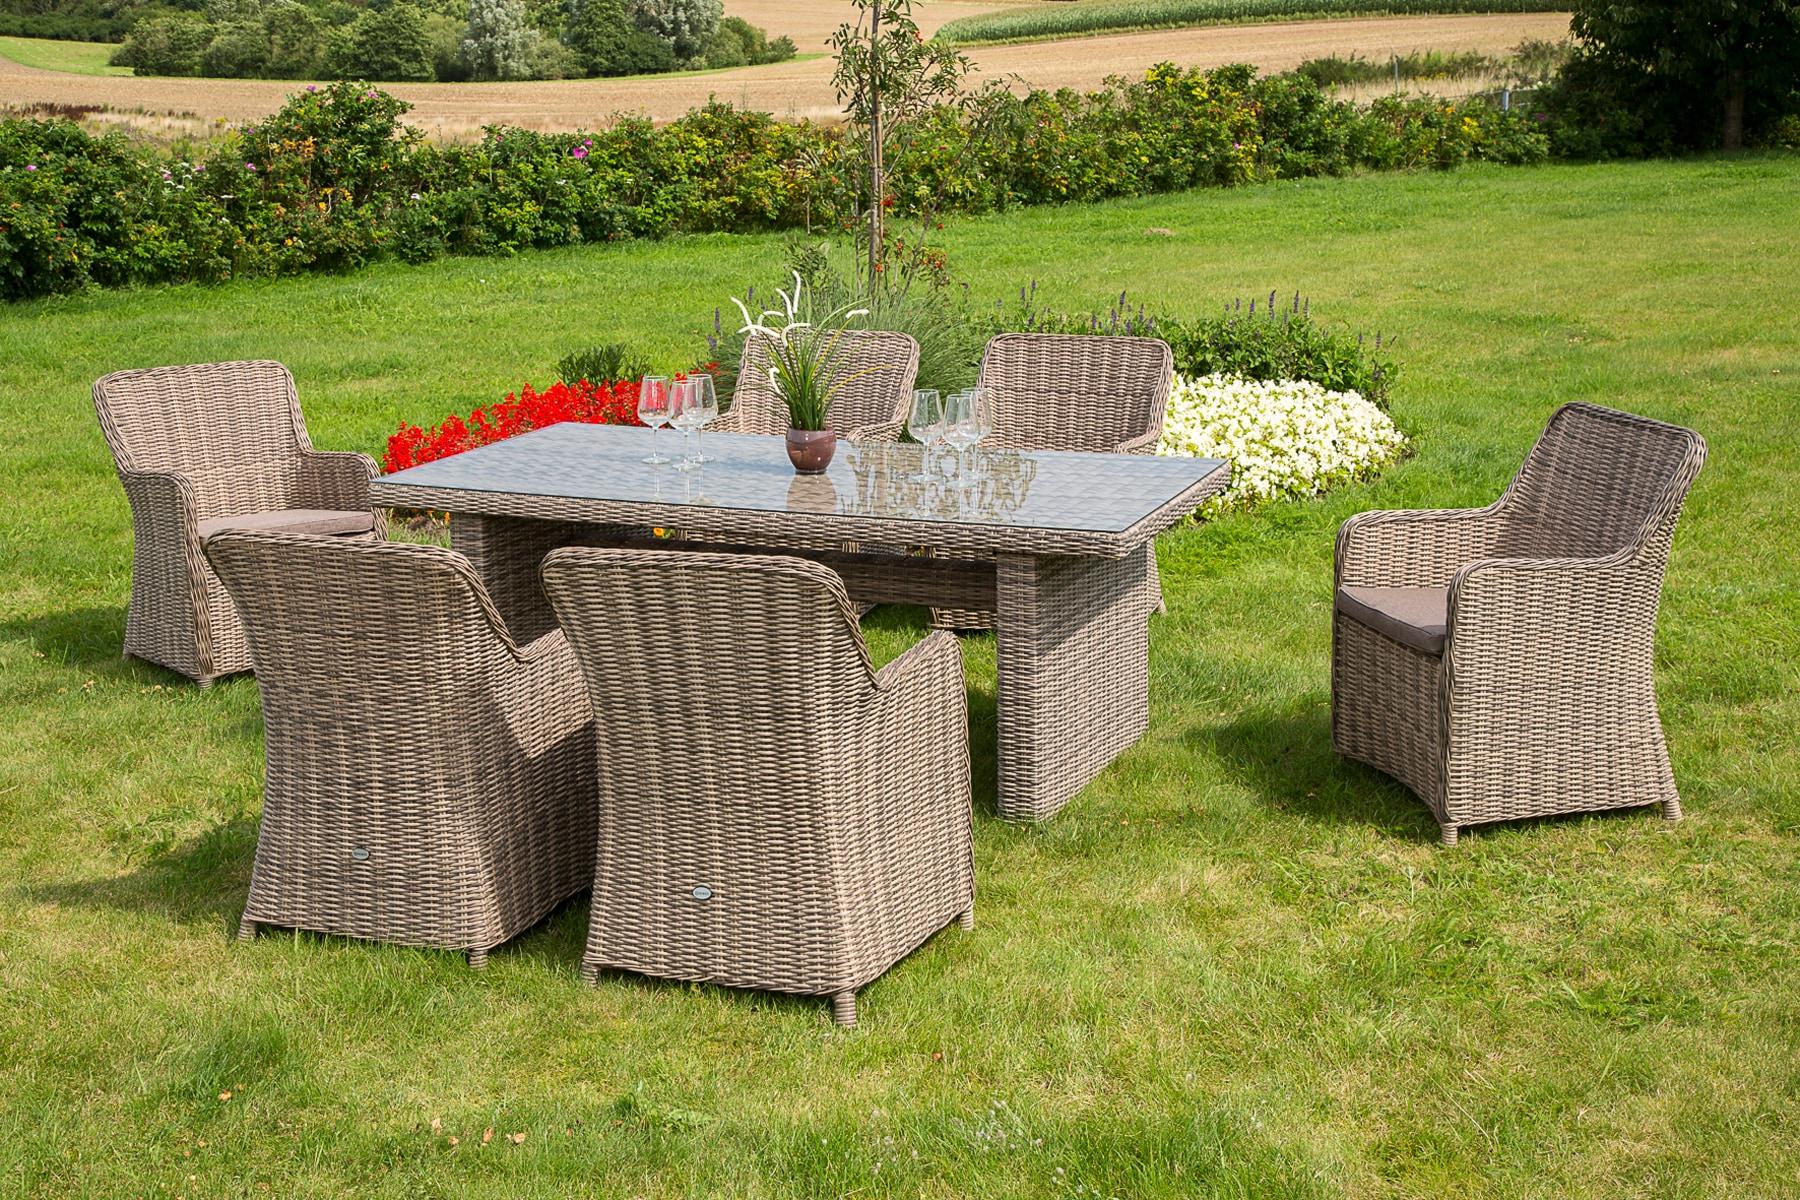 MERXX Gartenmöbelset Riviera NL 13-tlg 6 Sessel Tisch 200x100 Kunststoff/Stahl